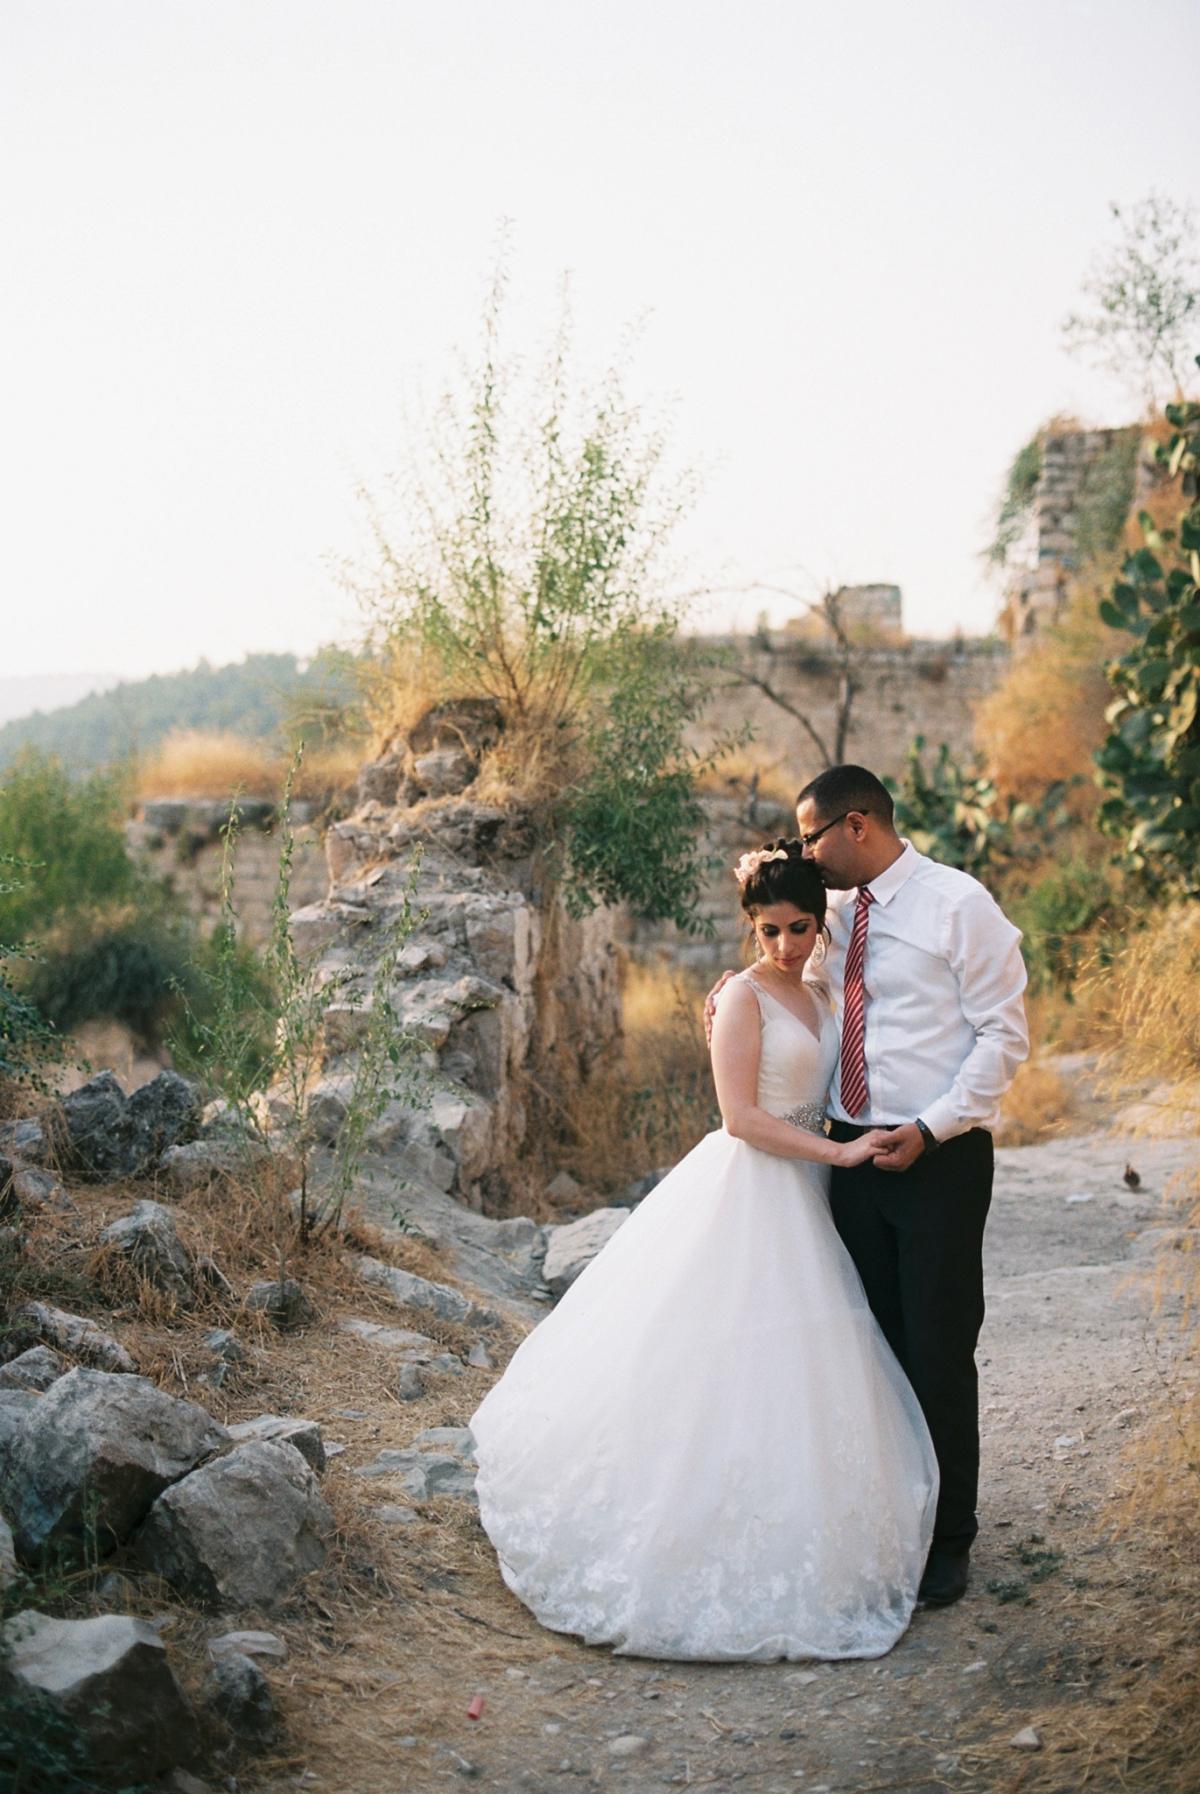 Lifta Bridal Portraits - Jerusalem Israel - Muna and Ali - Sigala Photography_0020